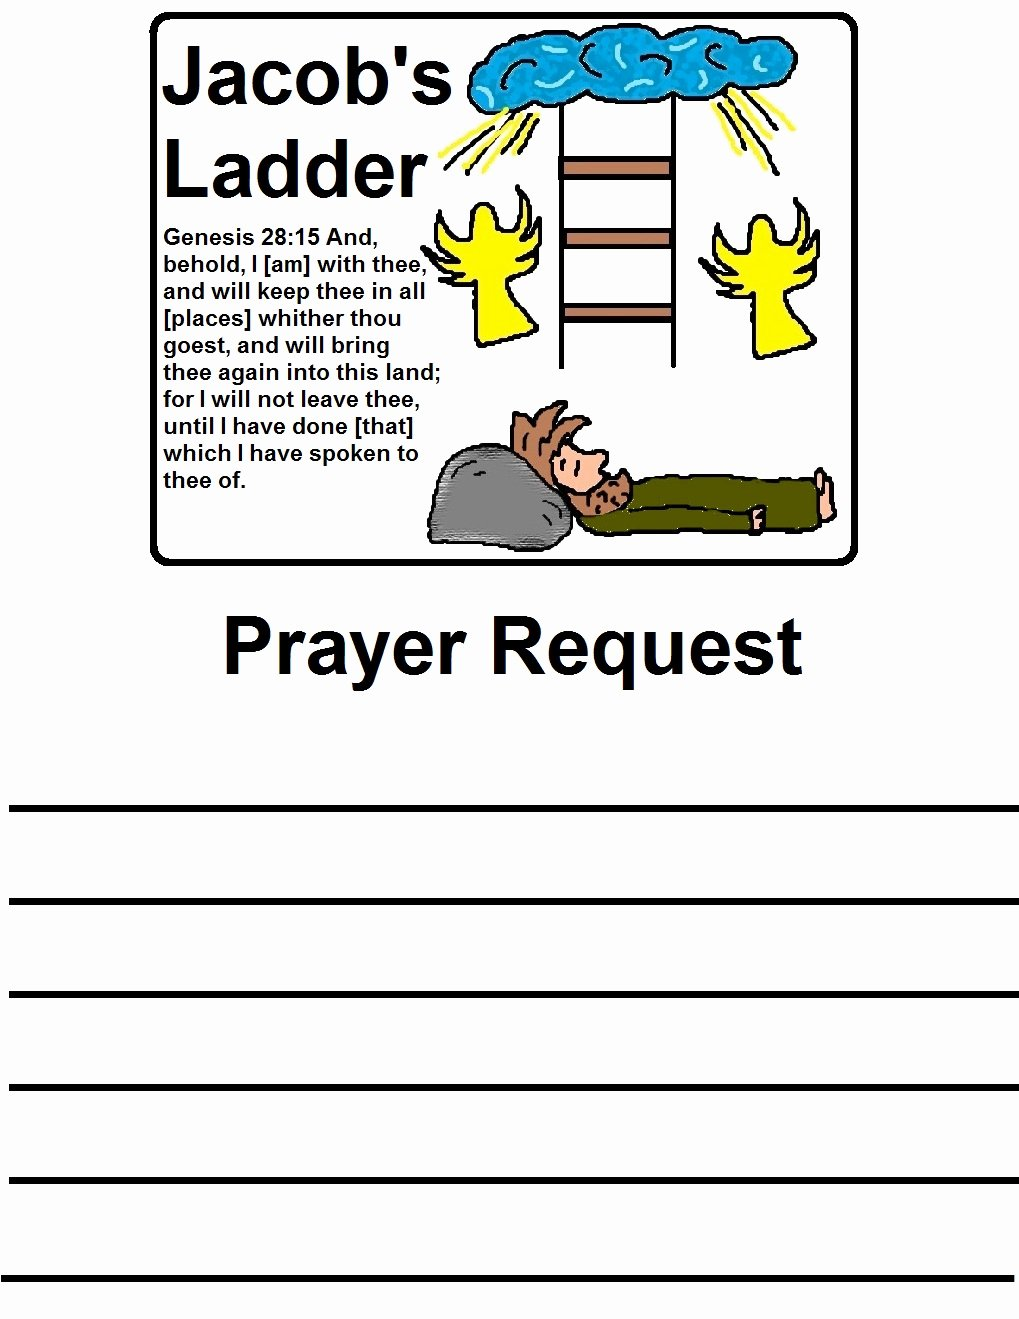 Prayer Request Cards Template Unique Jacob S Ladder Sunday School Lesson